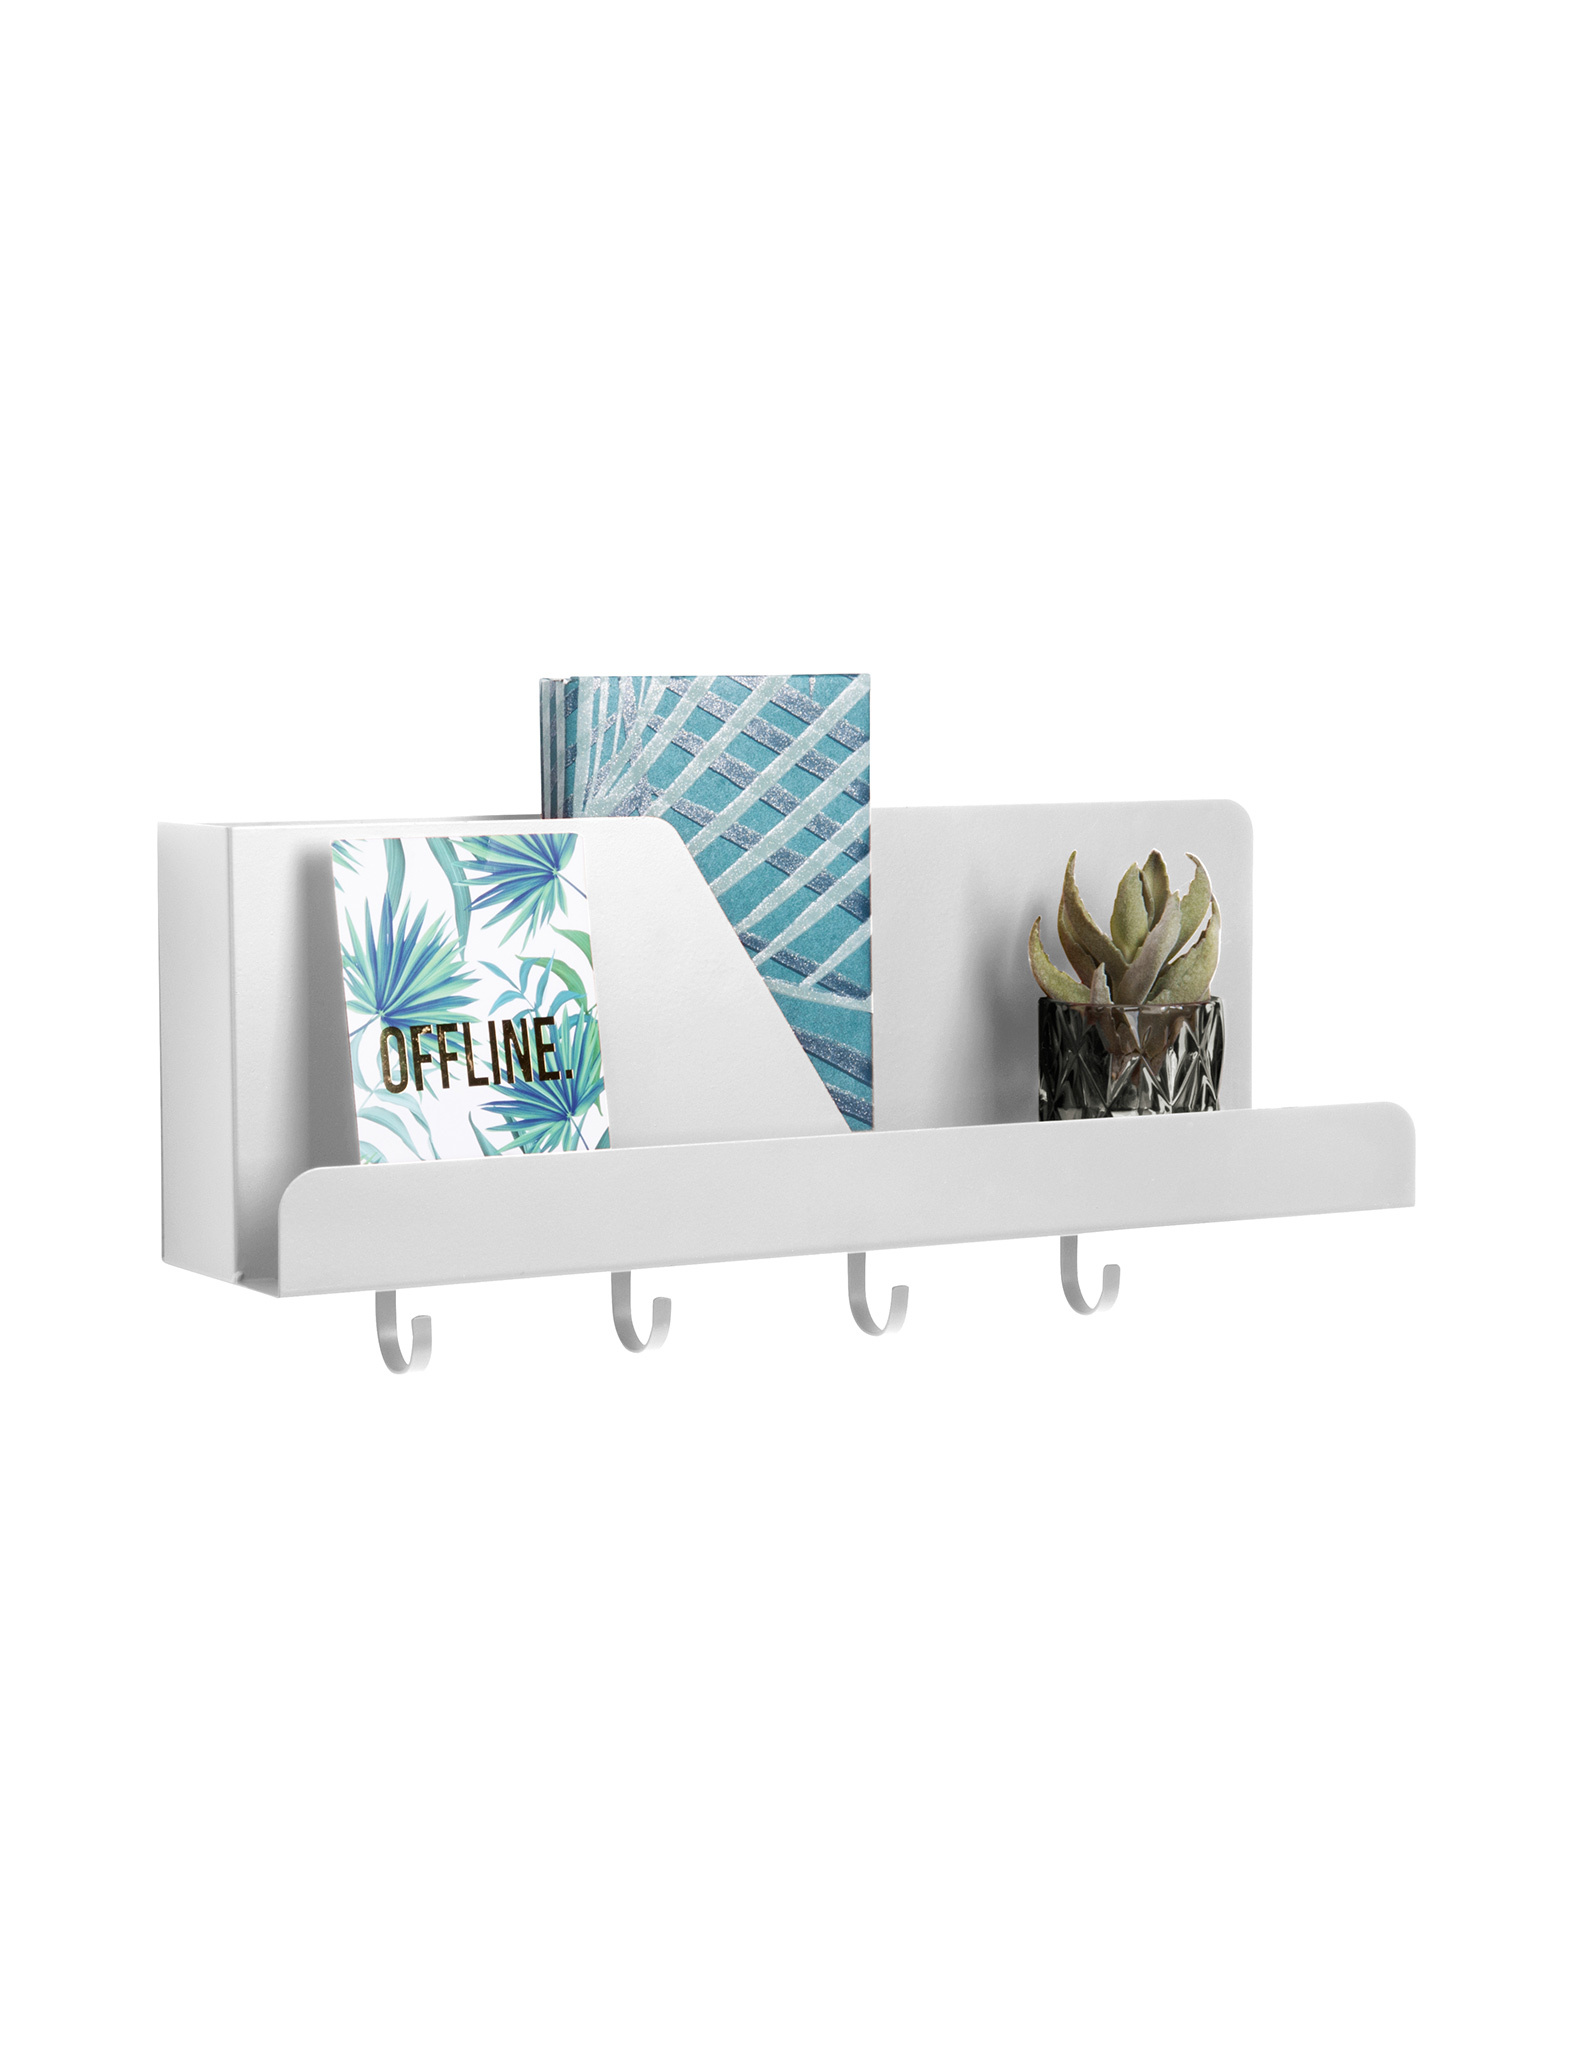 Prachtige witte wall organizer - Present Time